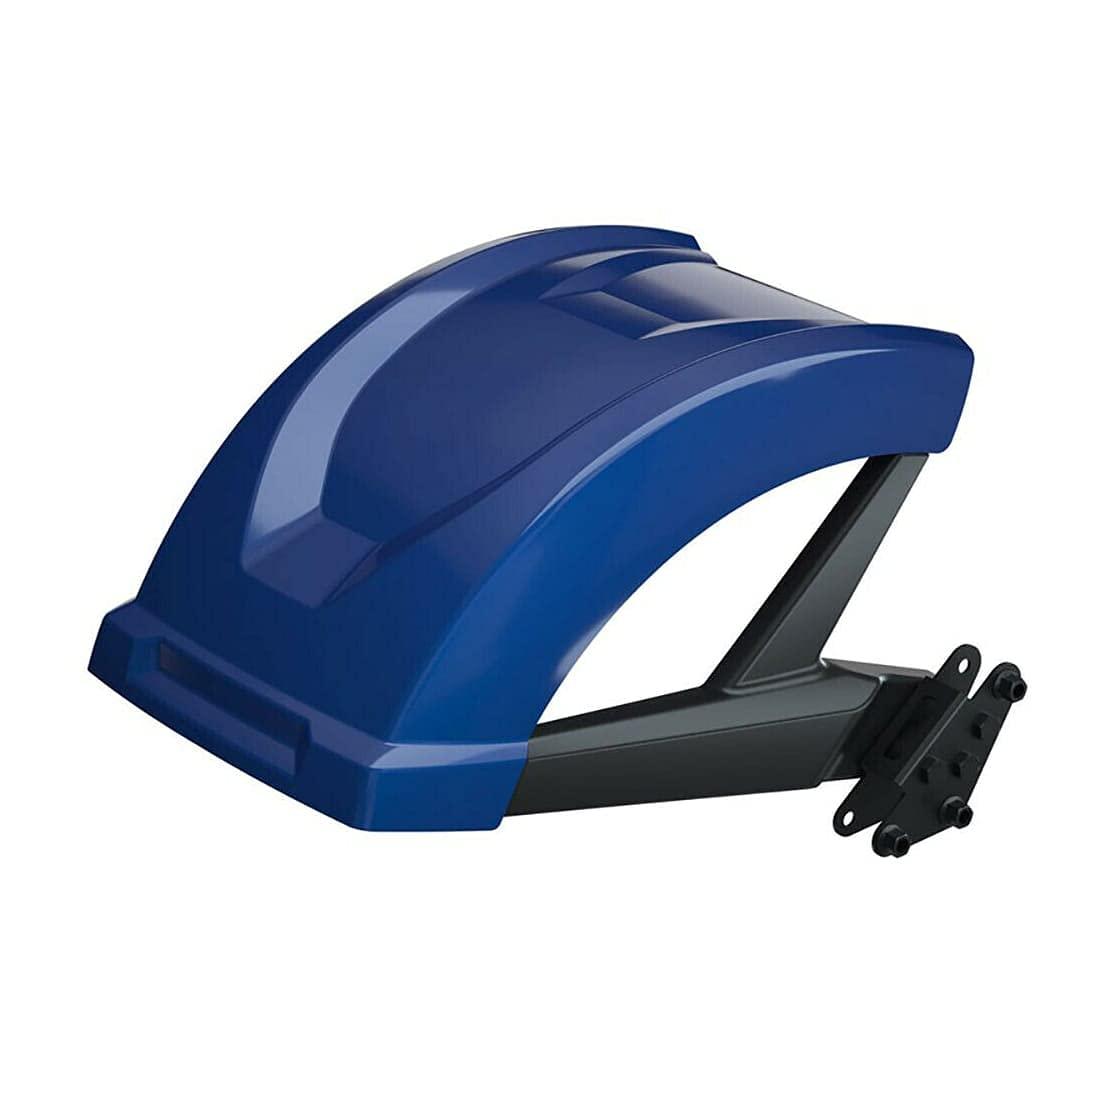 2883847-751 Blue Metallic Rear 305mm Sale price Fender 28 GT Dallas Mall 2020-2021 R SL